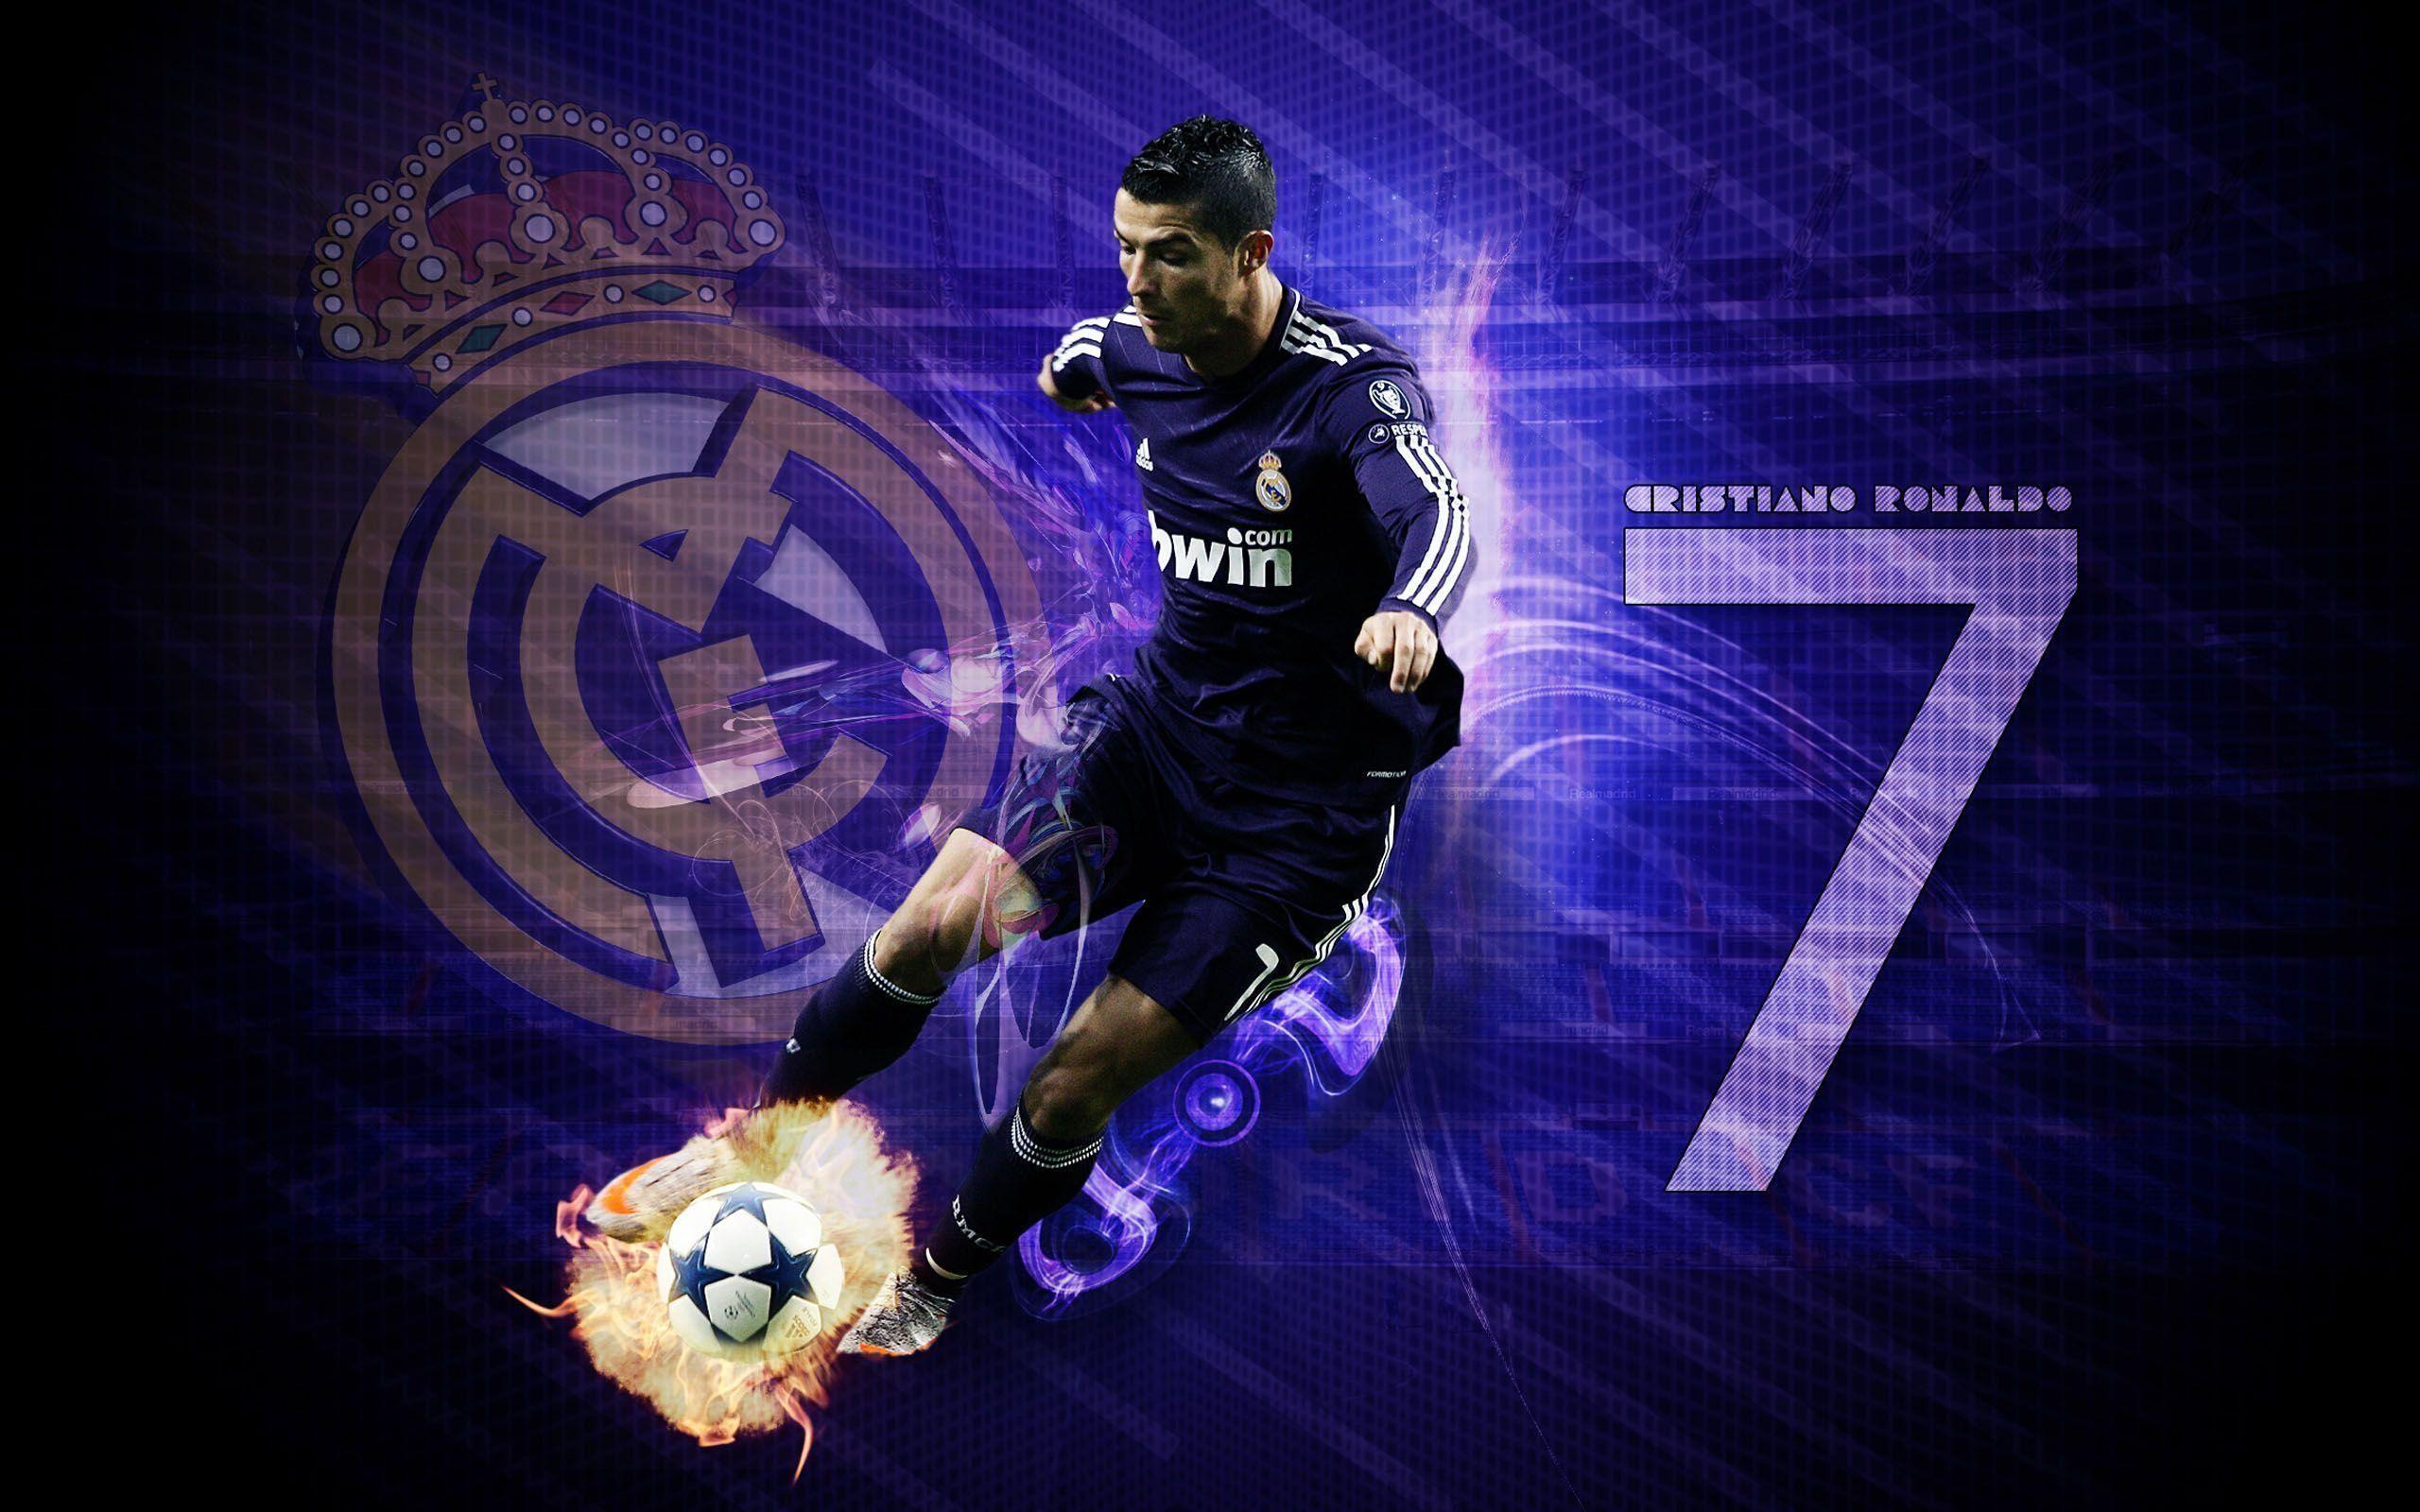 Best Hd Ronaldo Real Madrid Wallpaper High Definition Wallpaper Real Madrid Wallpapers Madrid Wallpaper Soccer Backgrounds